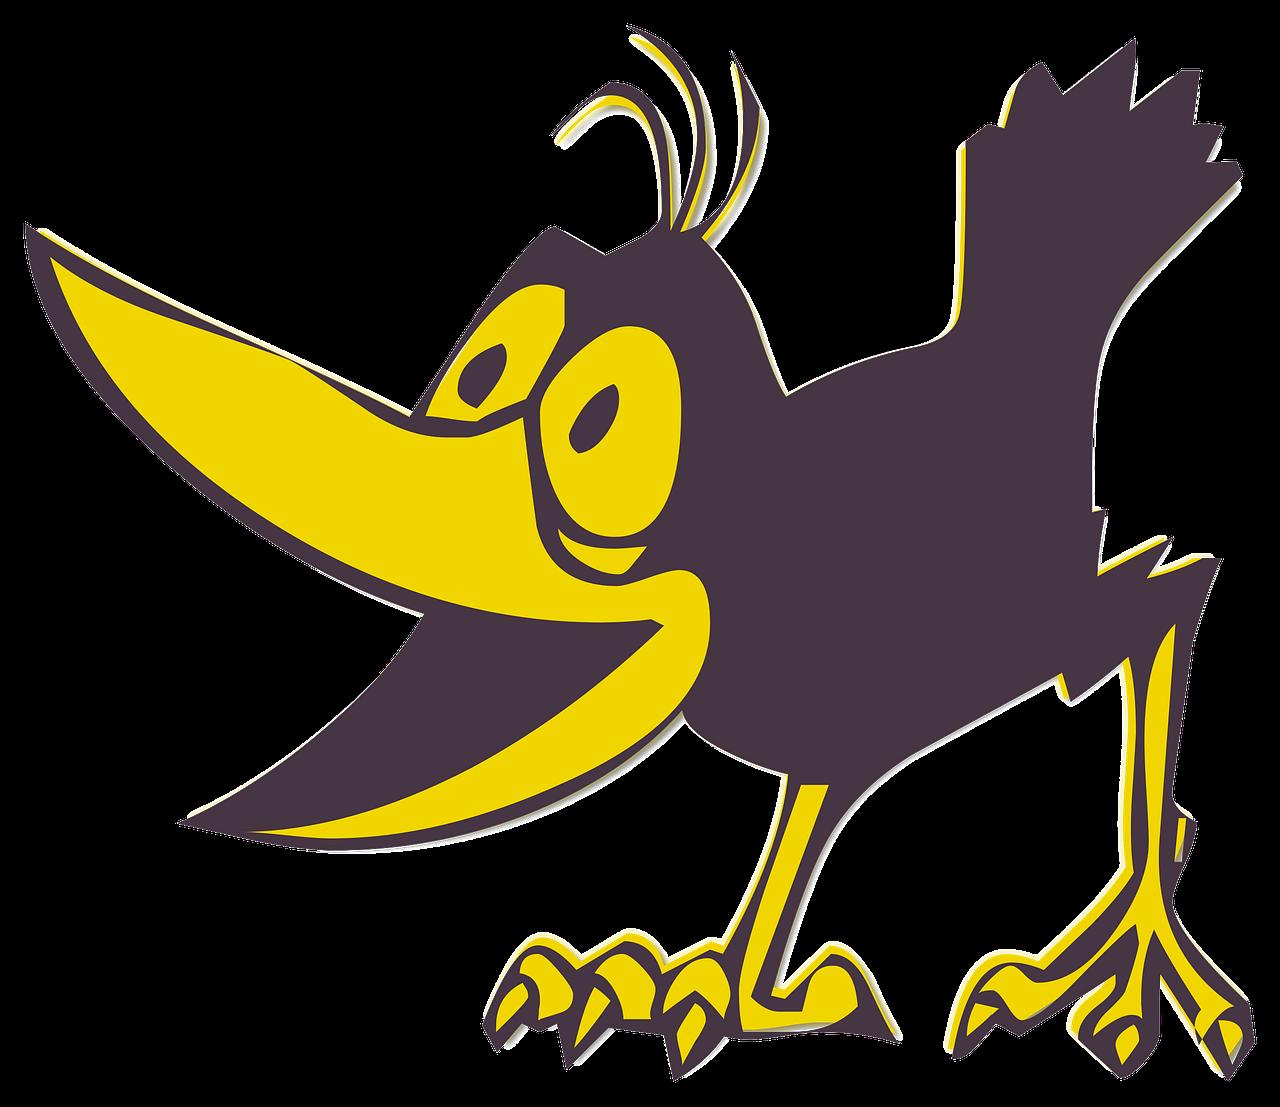 Funny Bird Cartoon Free Image On Pixabay